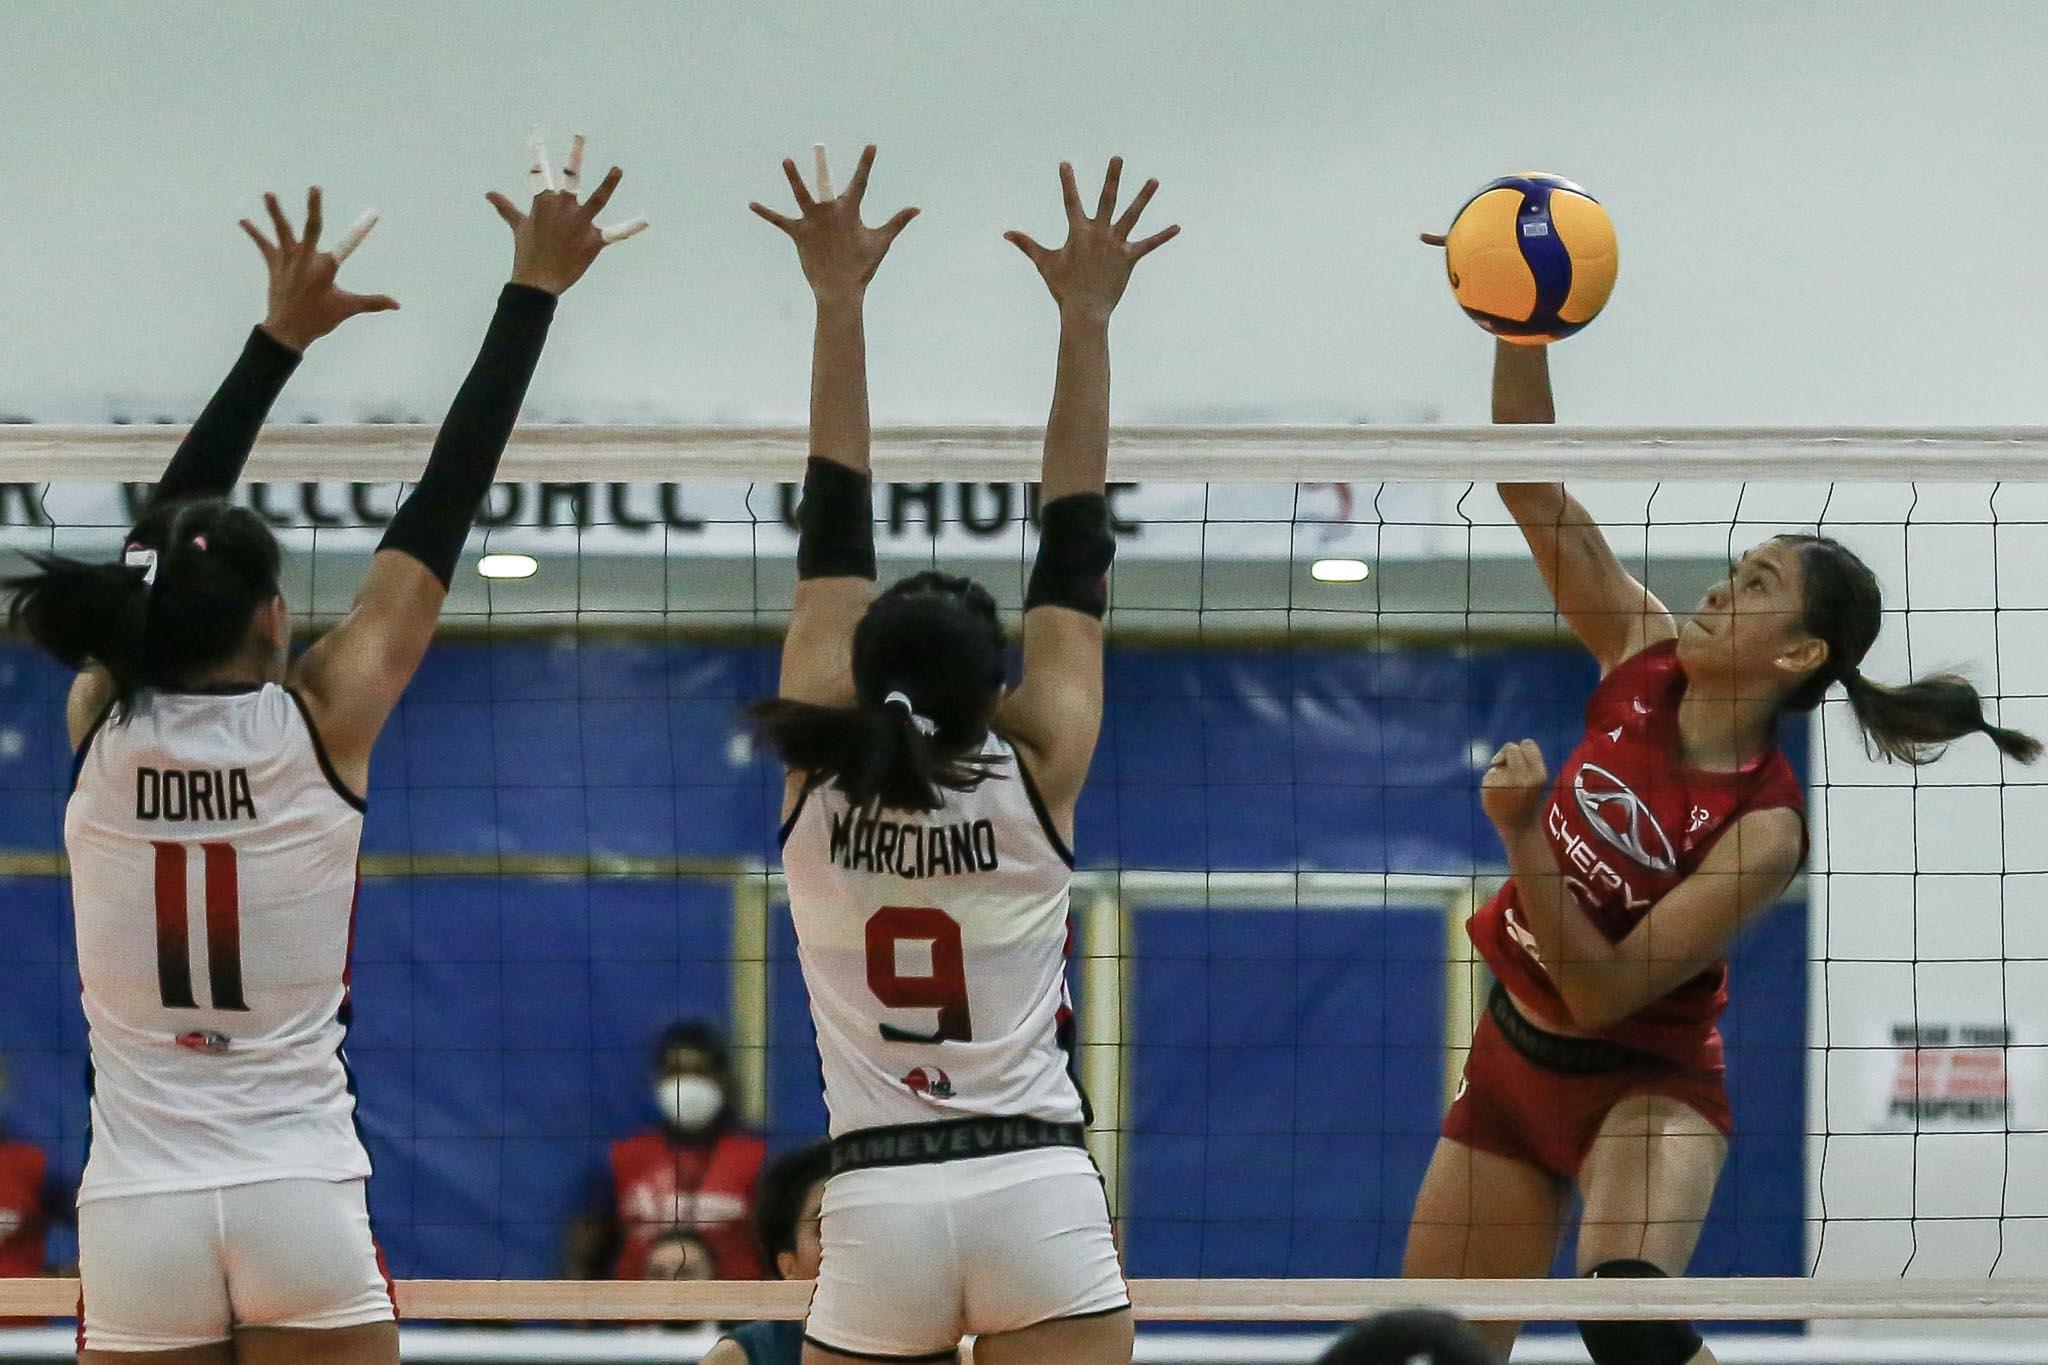 2021-PVL-Open-Chery-Tiggo-vs-Cignal-Arianne-Layug Yhan Layug uses struggles during pandemic as motivation in PVL News PVL Volleyball  - philippine sports news